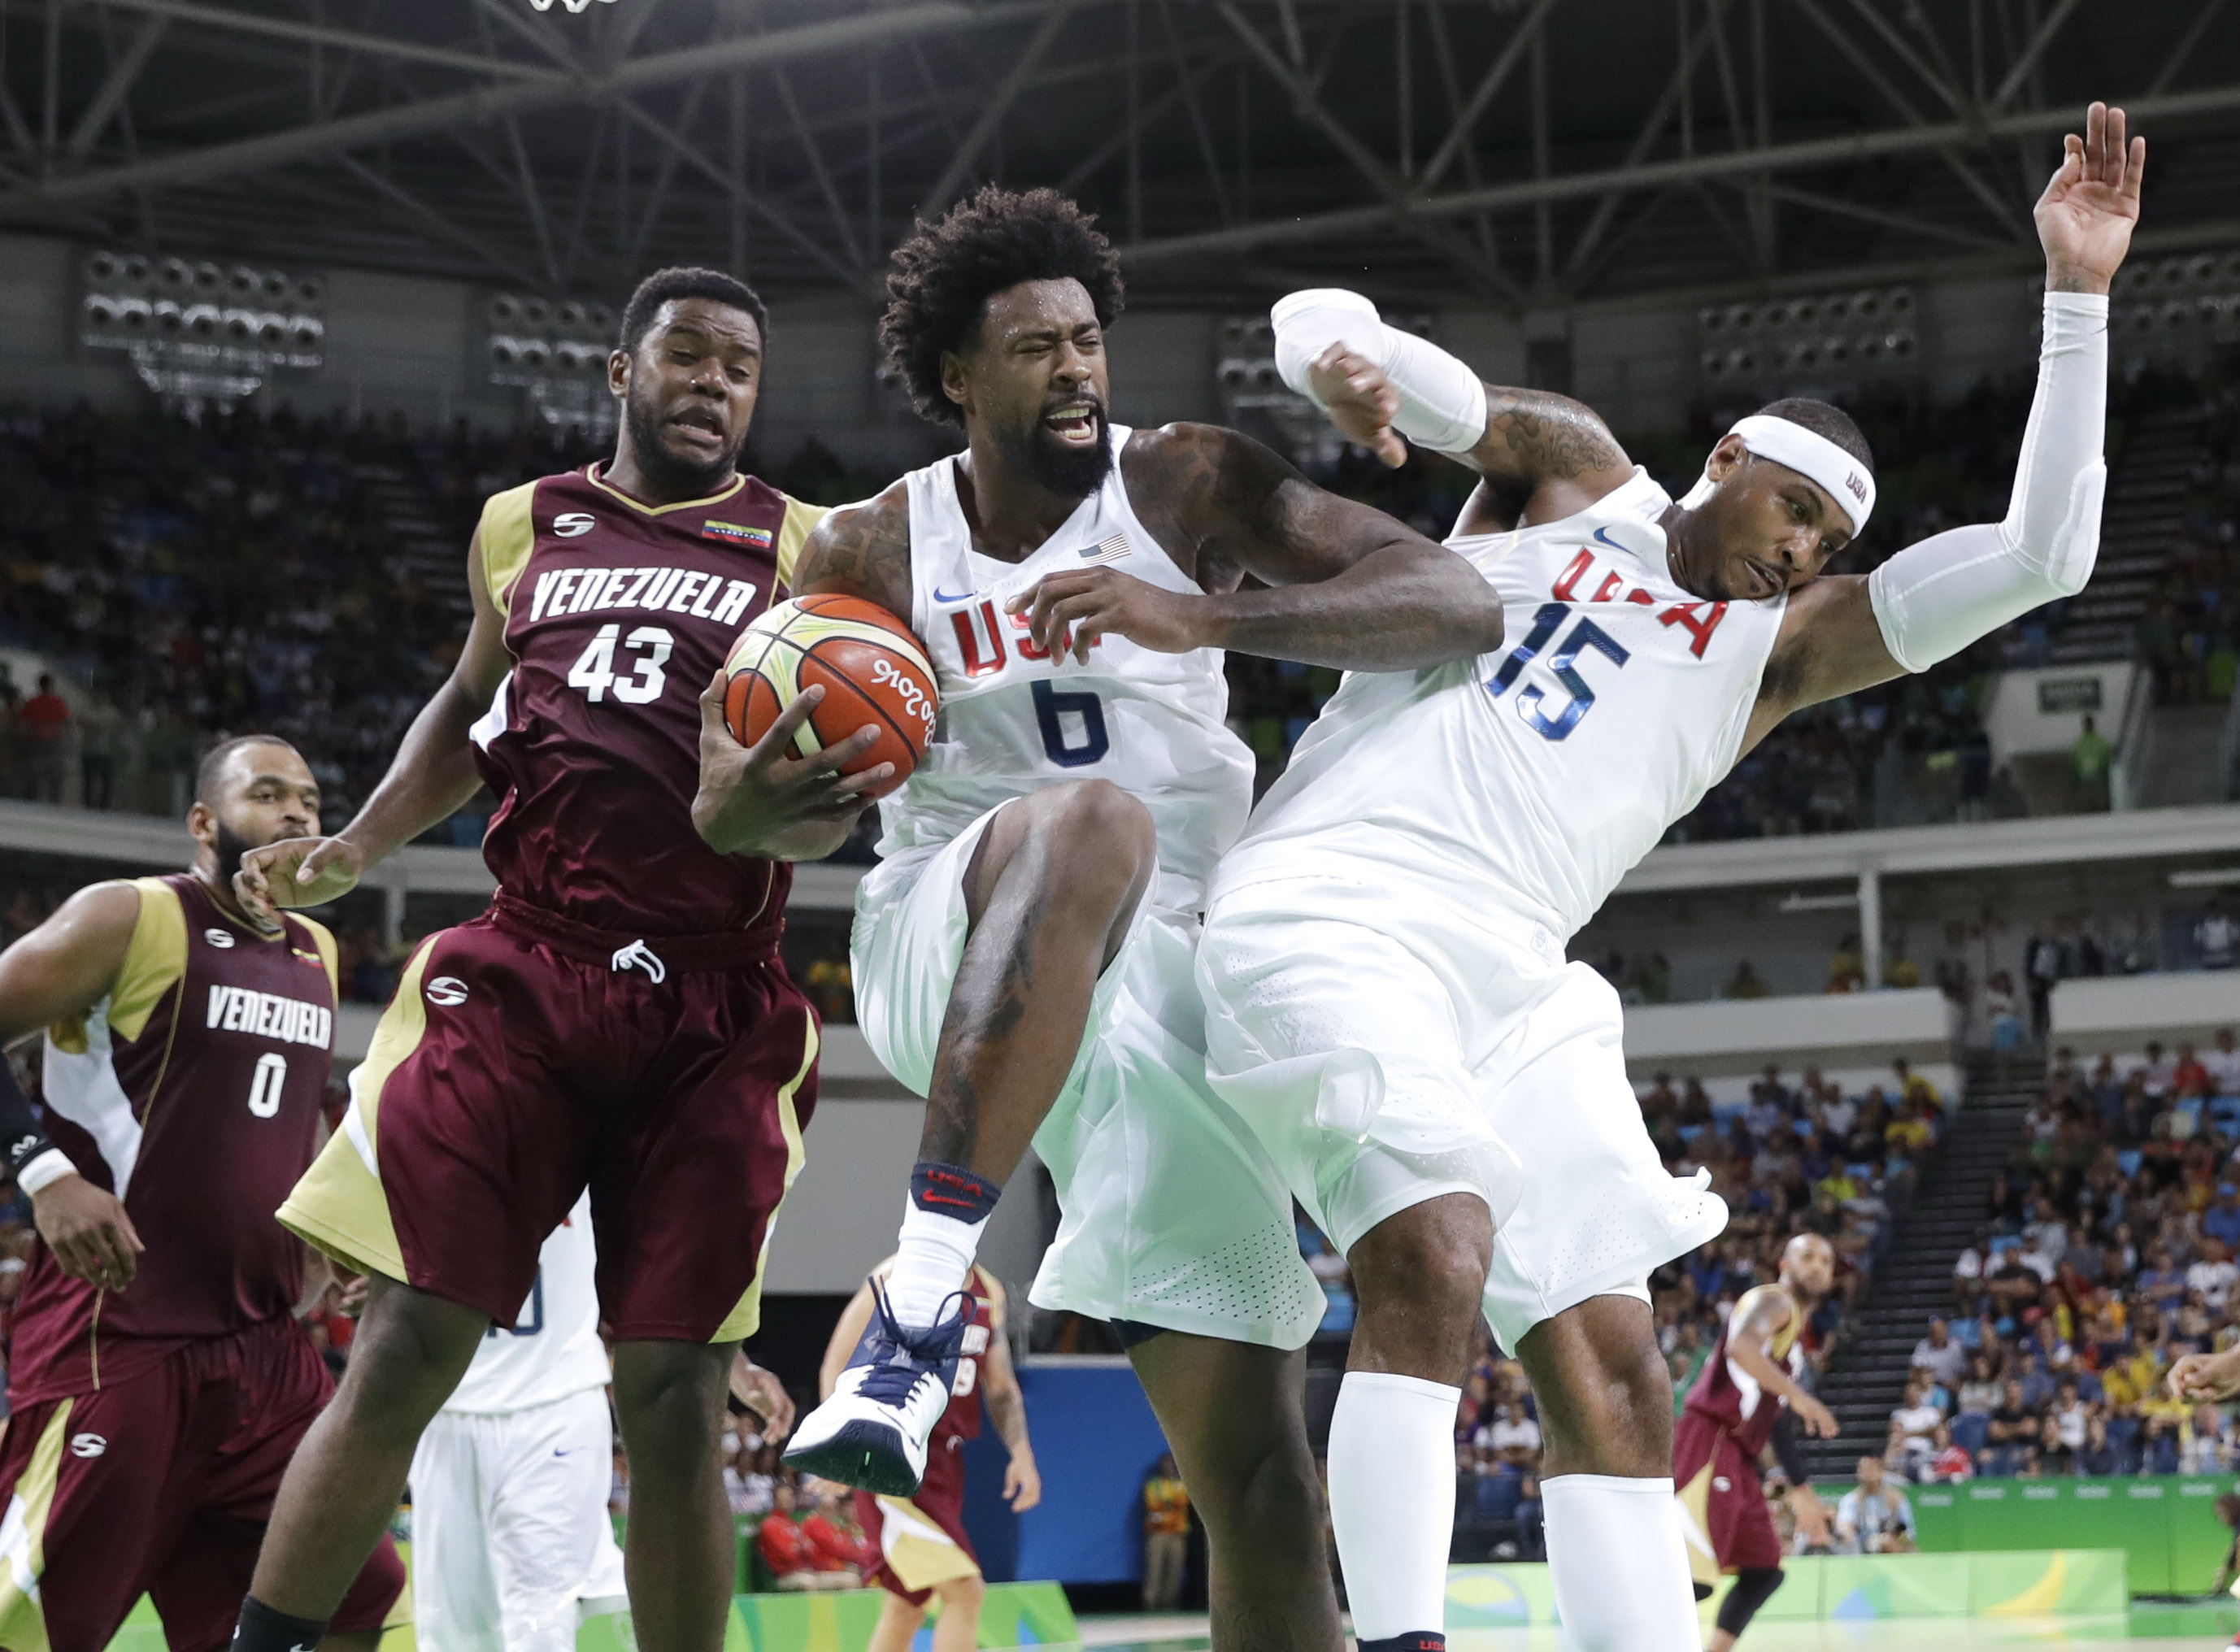 omens basketball blasts usao - HD2755×2032